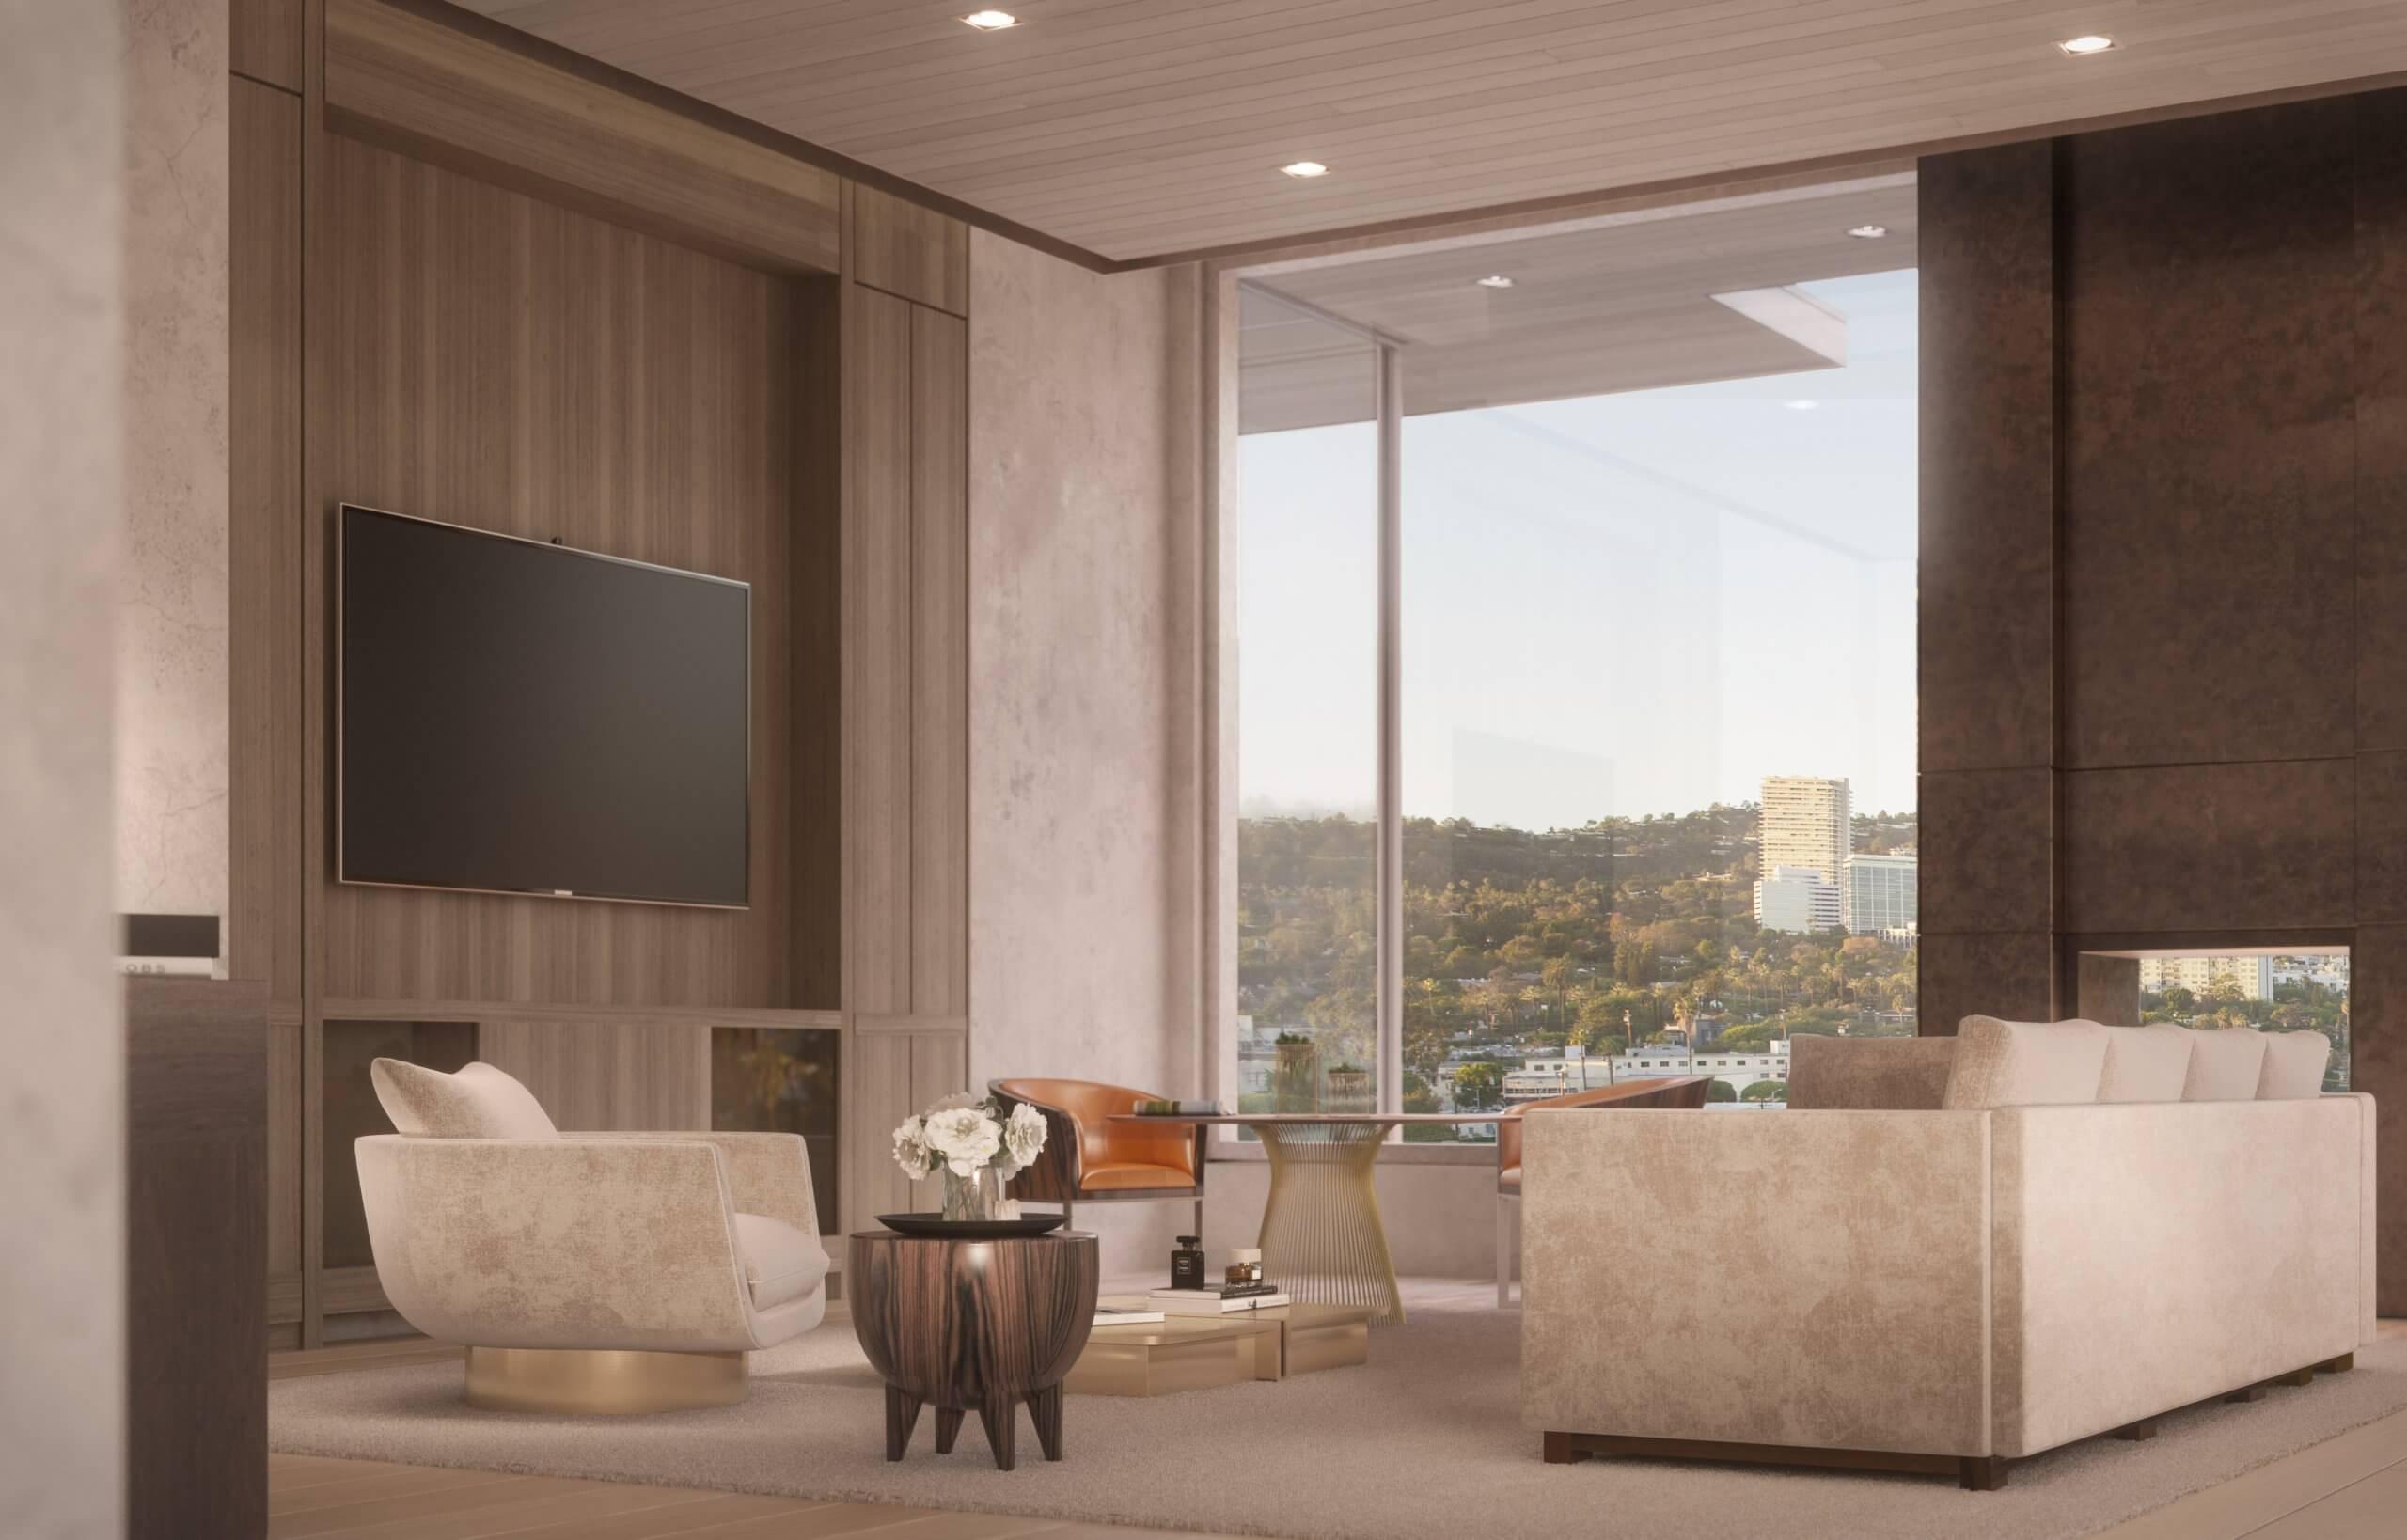 Penthouse-01_Vignettes_Daytime_Living-Room